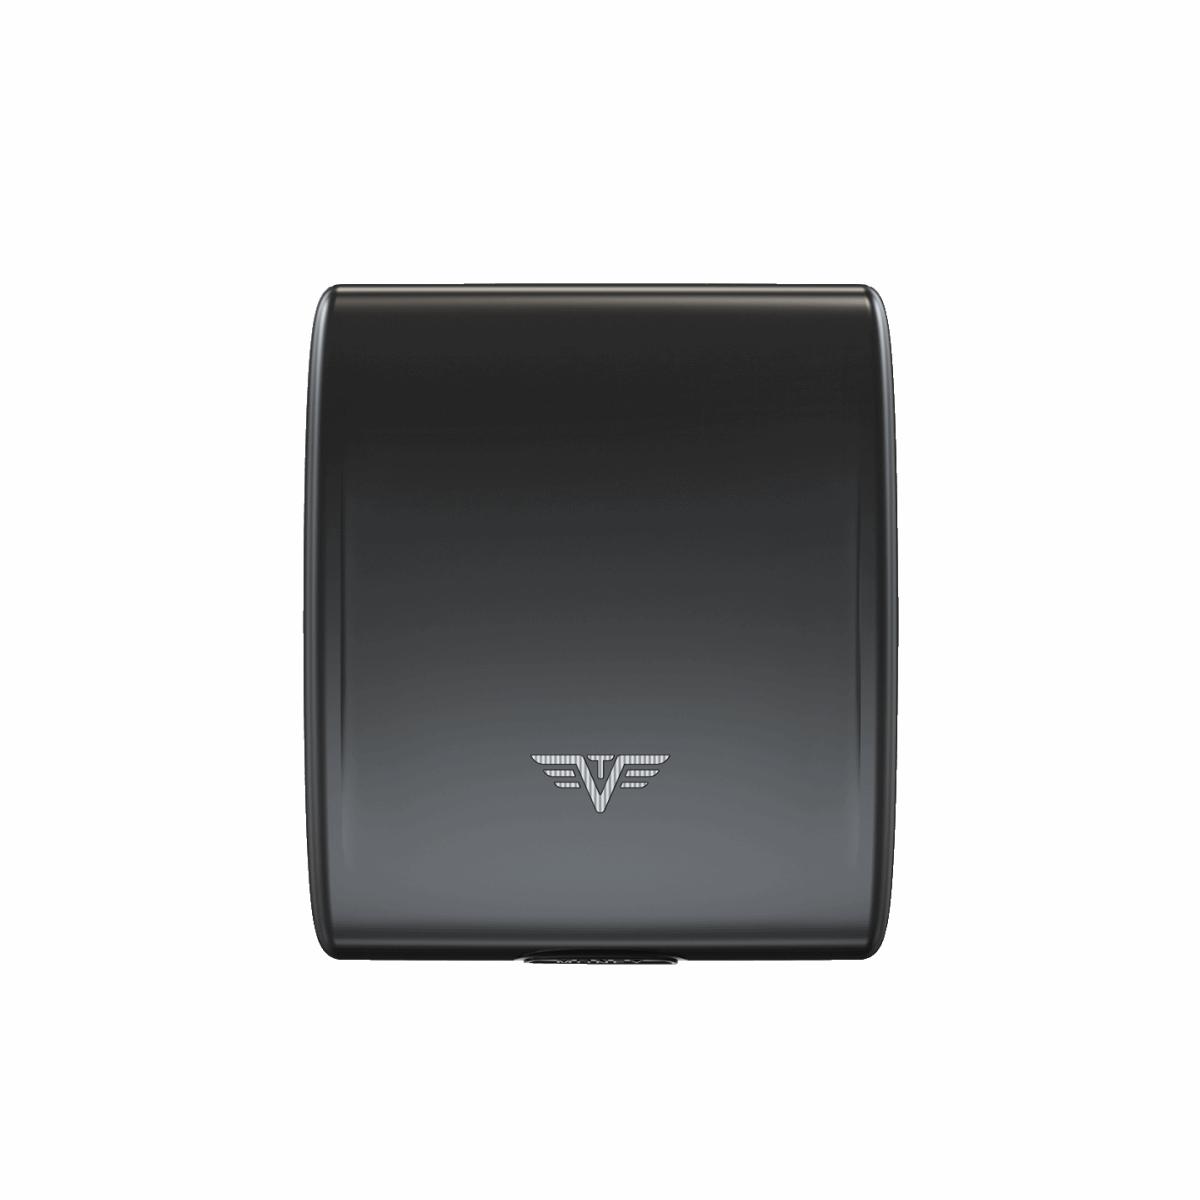 TRU VIRTU Aluminum Wallet Beluga - Money & Cards - Black